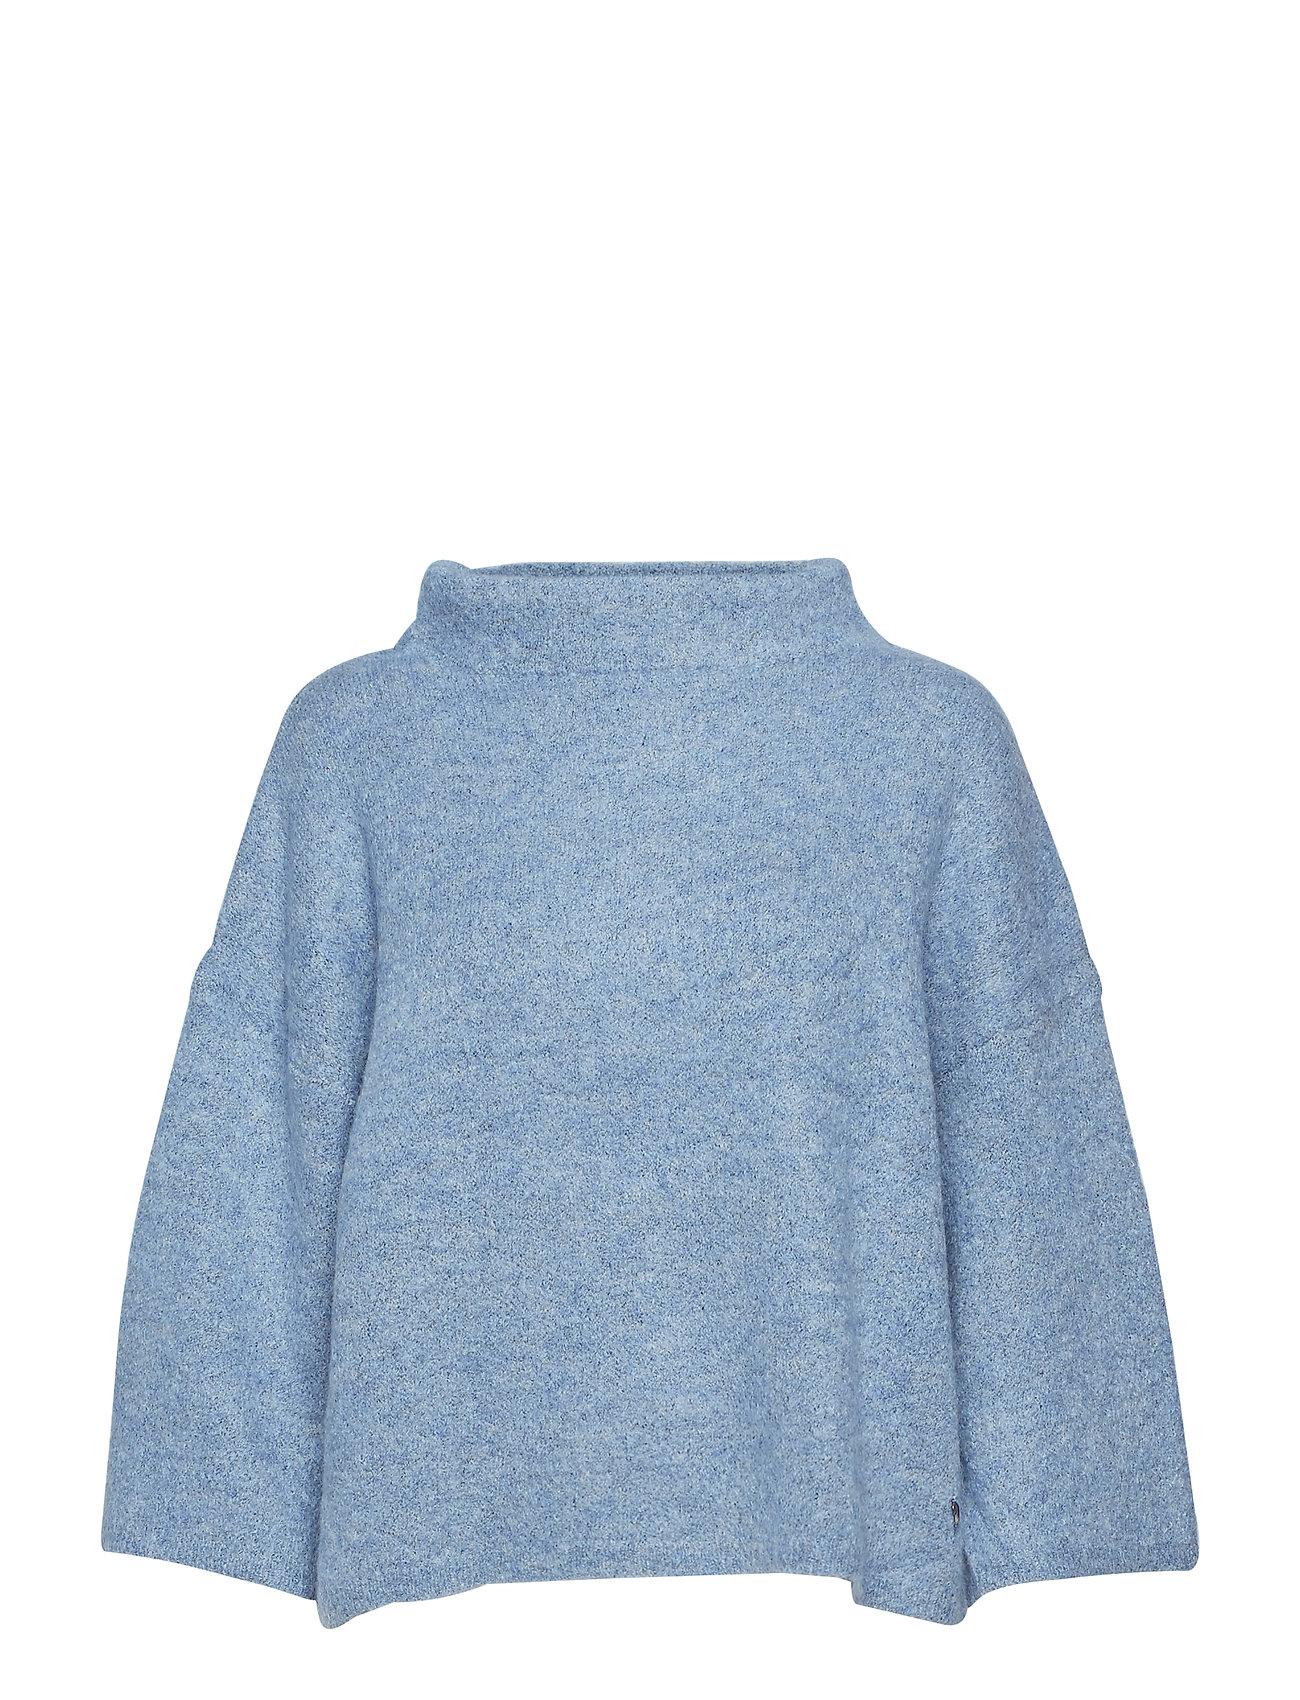 Sweater In Mohair W. High Neck - Coster Copenhagen